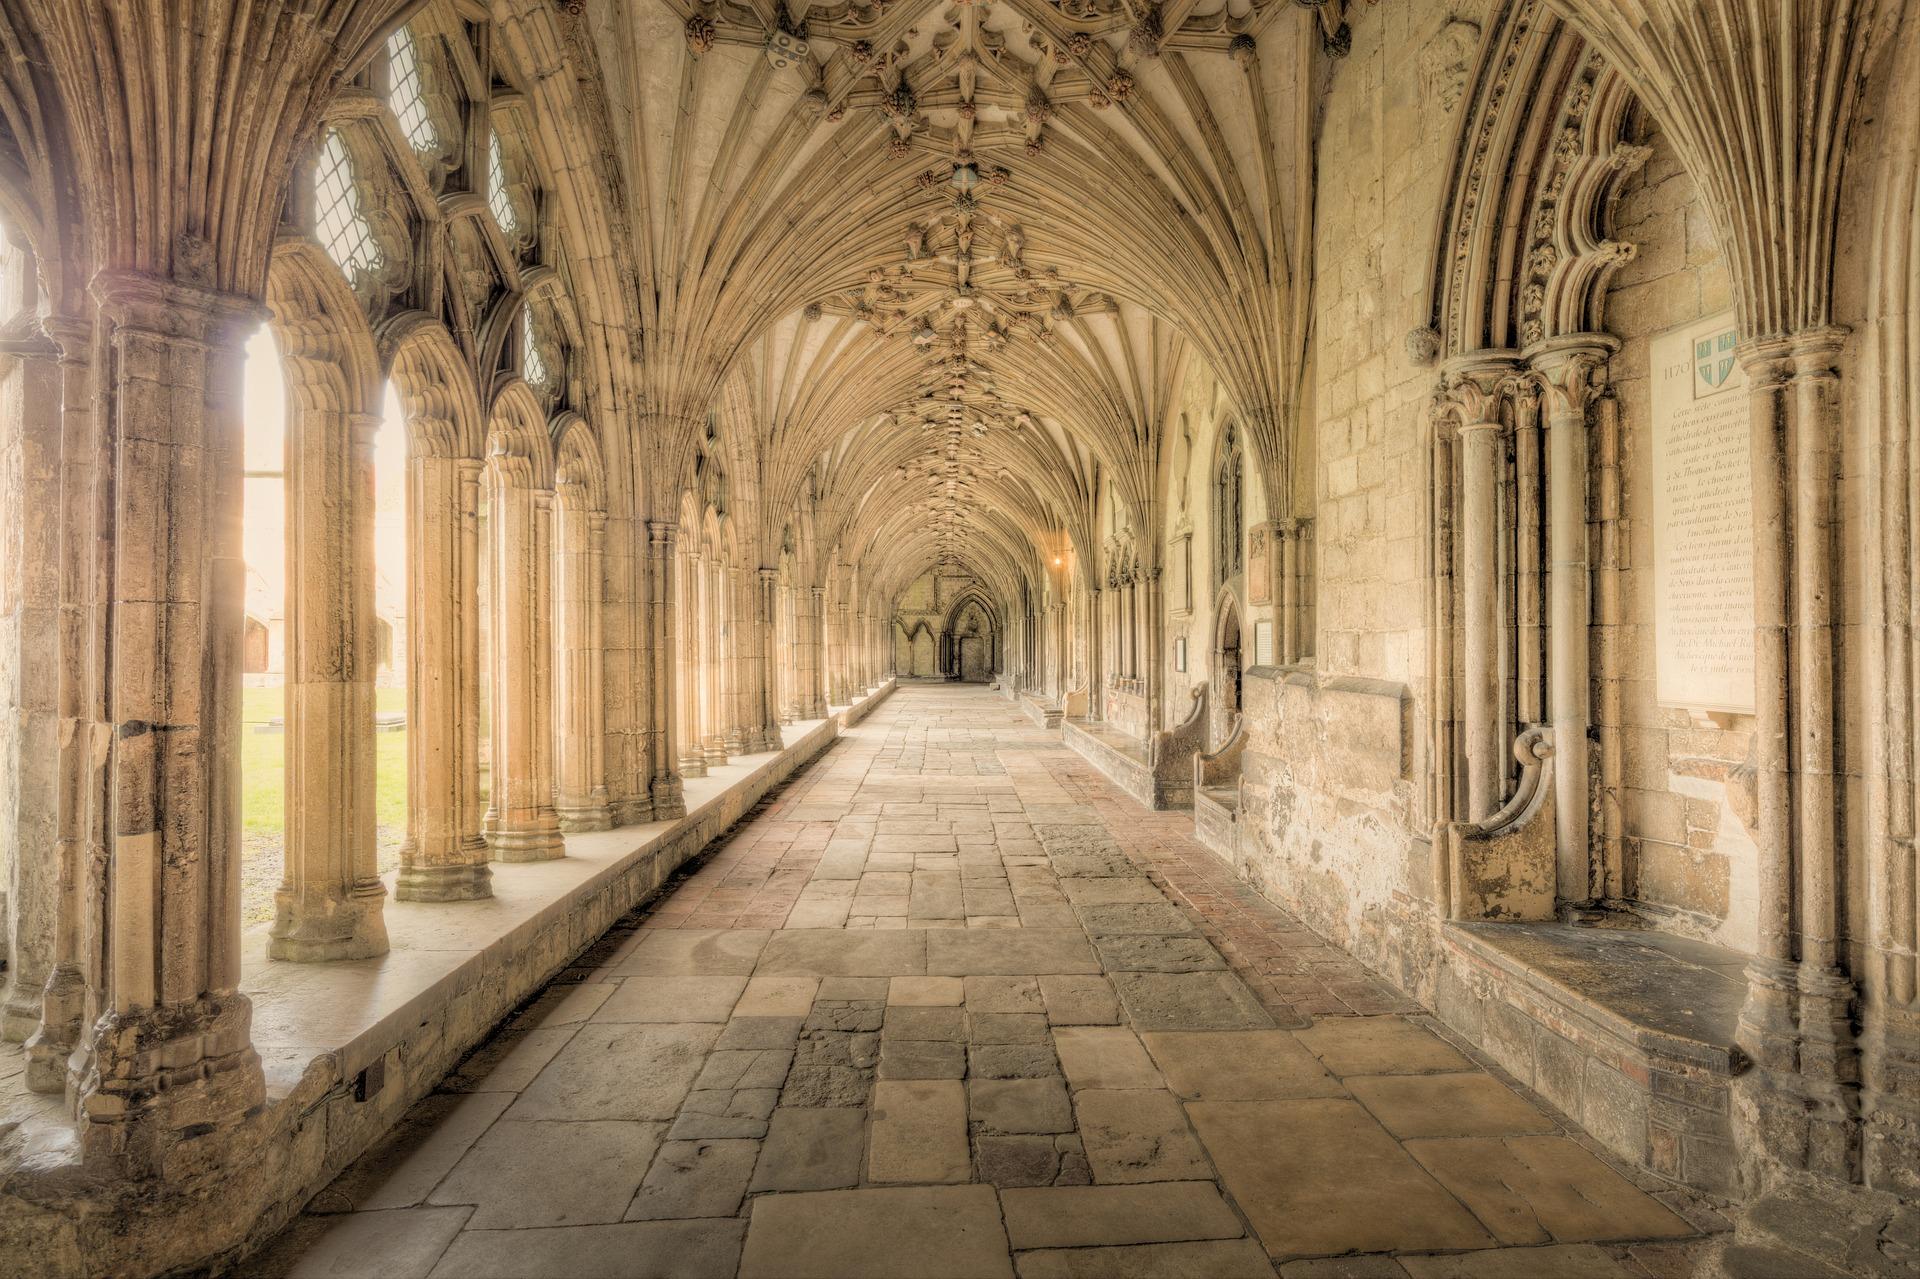 canterbury-cathedral-3530366_1920.jpg